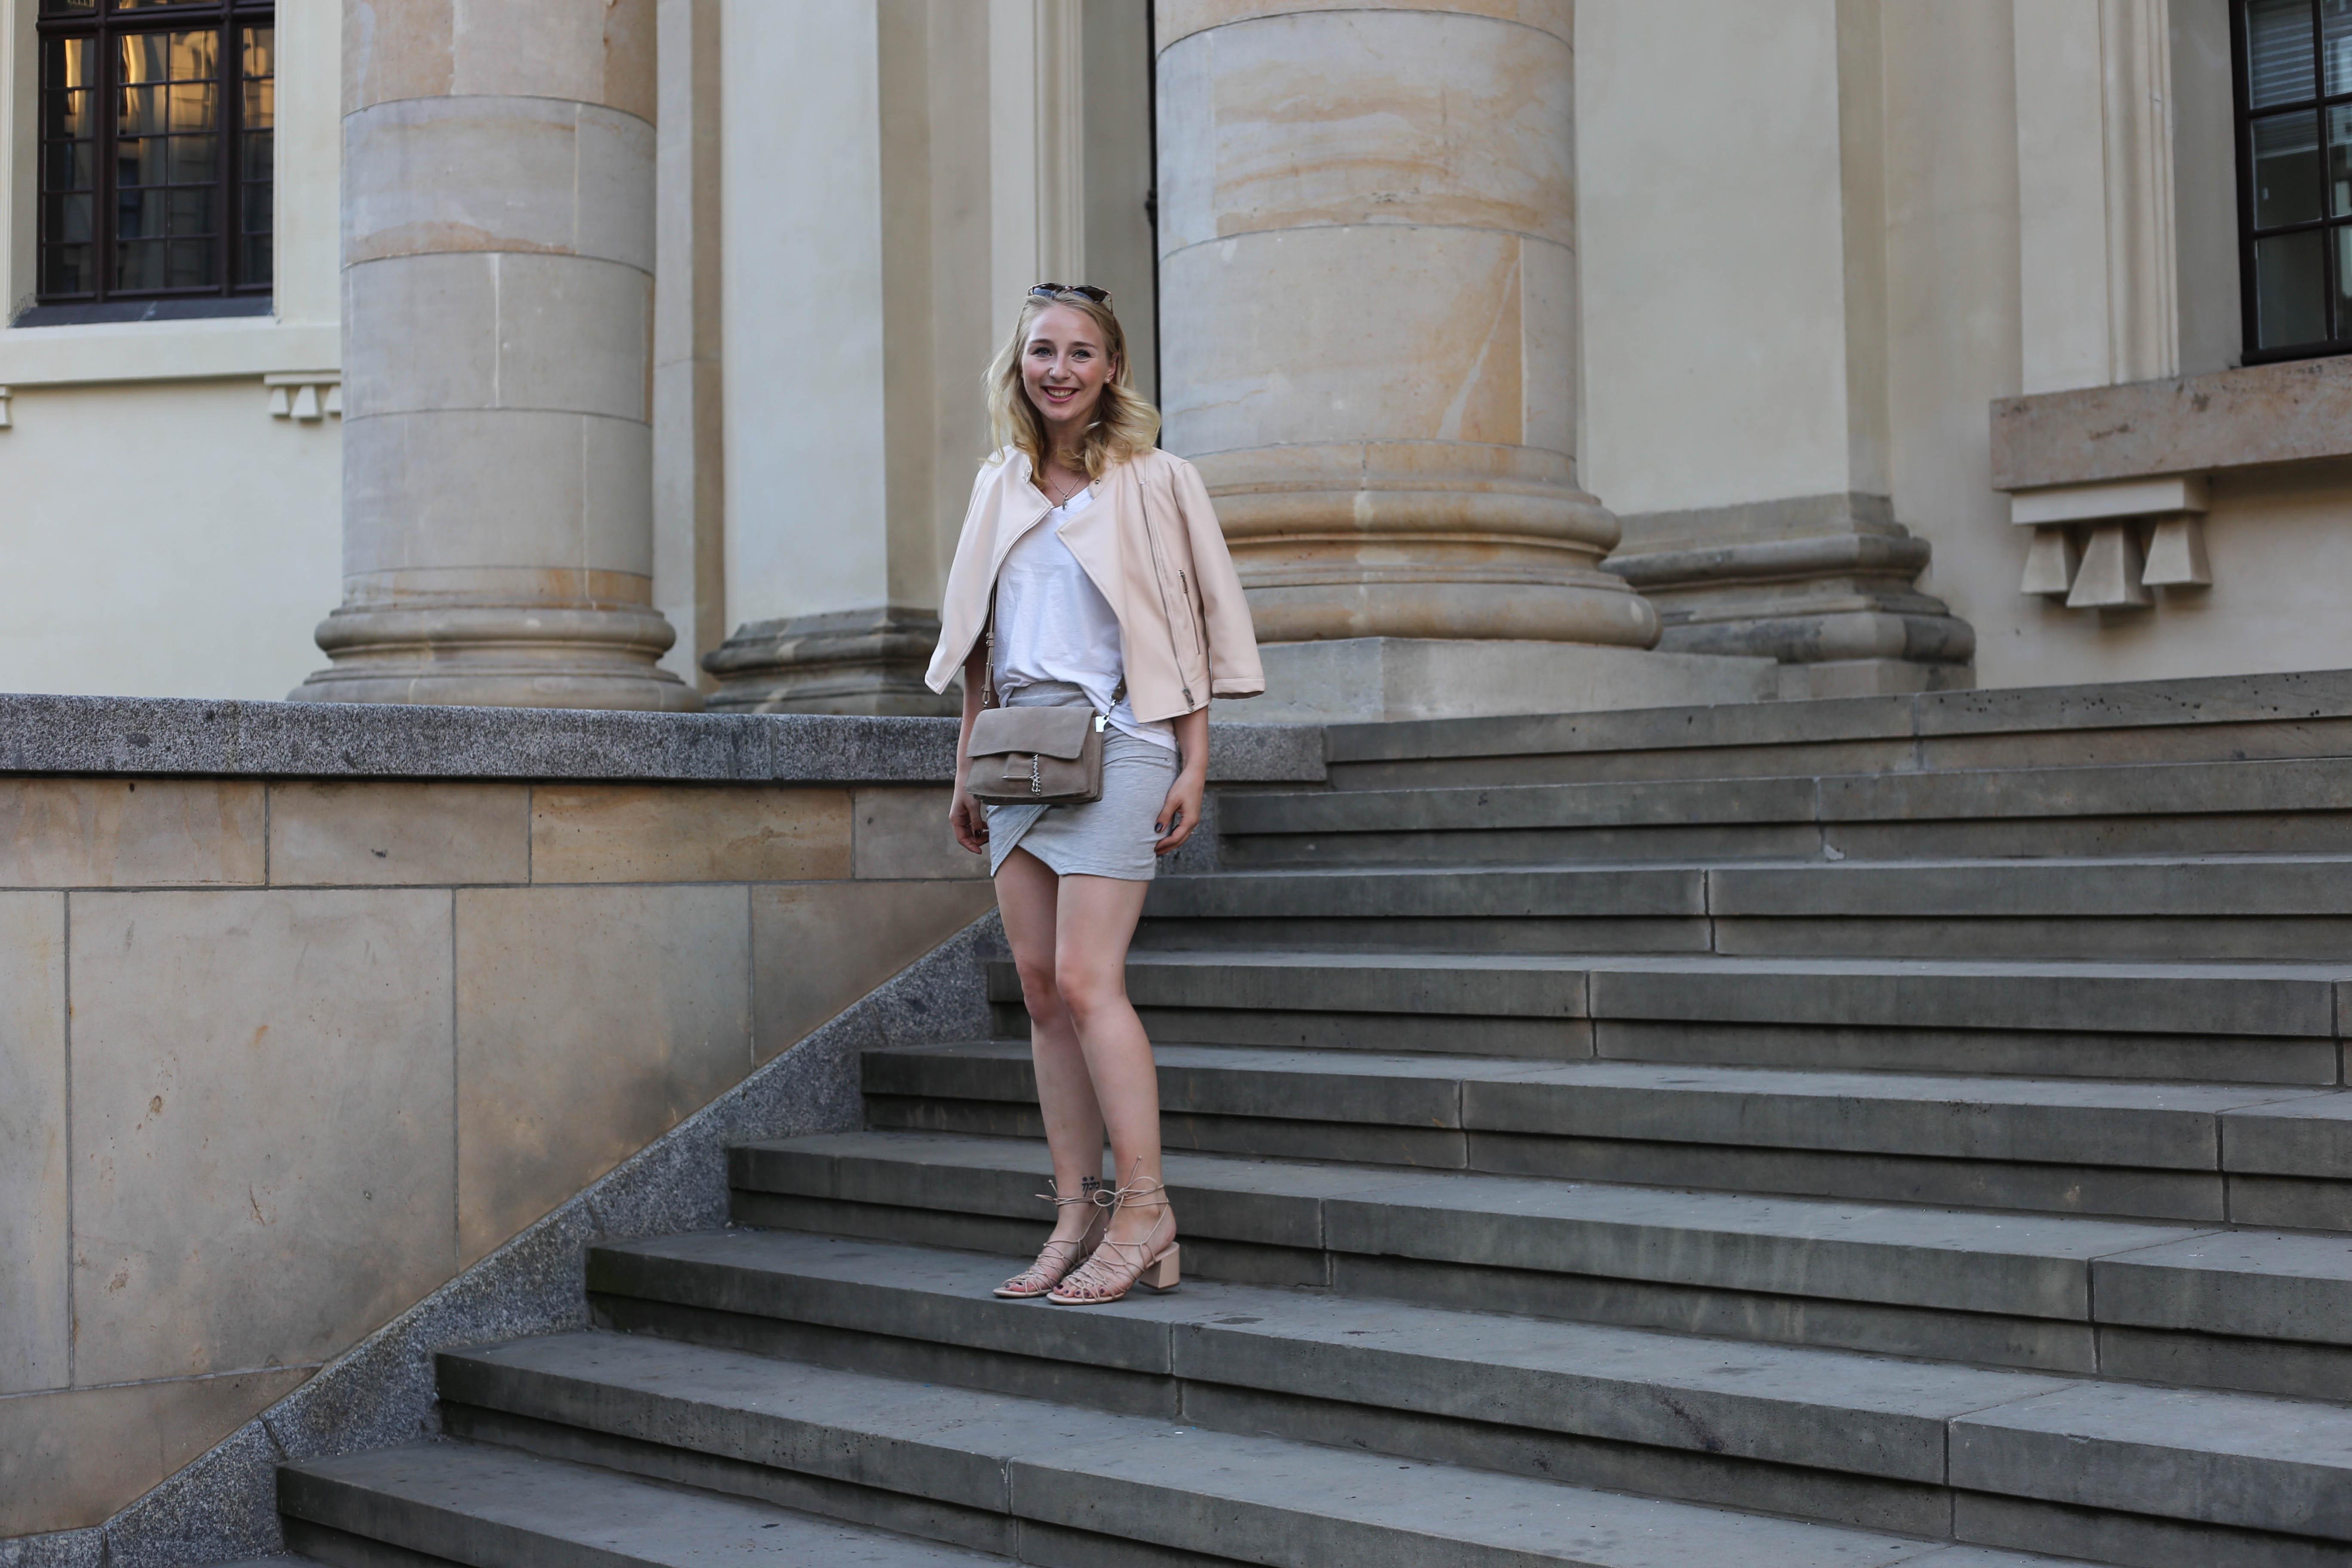 sommerlook-rosa-lederjacke-mango-klotzabsatz-sandalen-fashionblog-berlin-mode-blog-outfit_2337